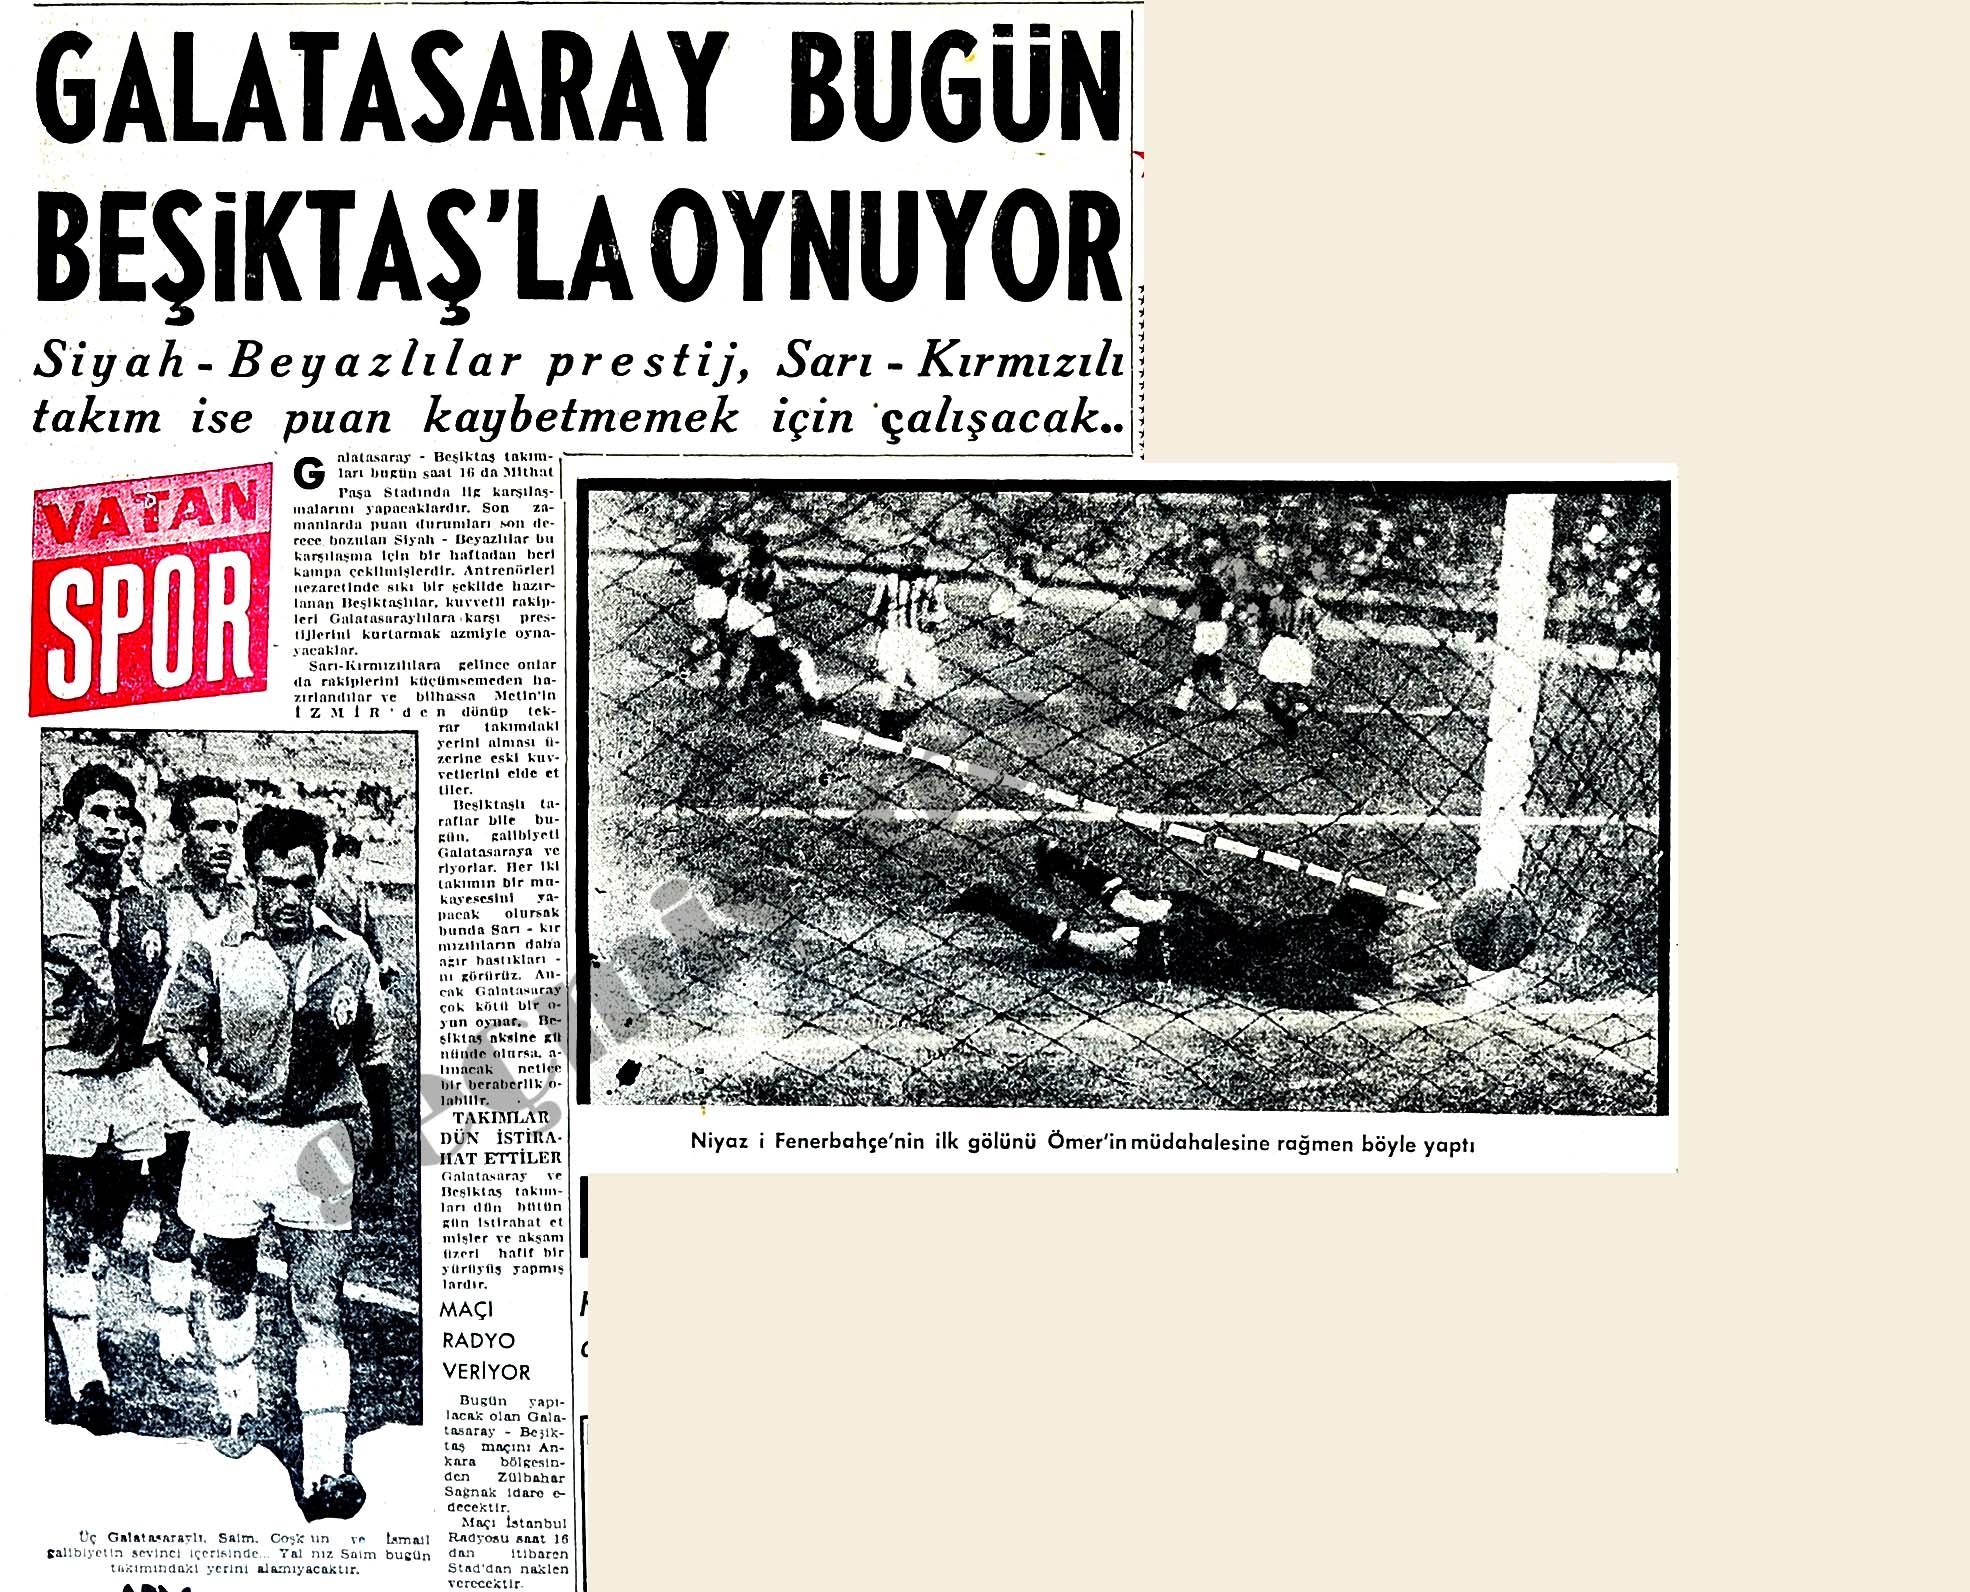 Galatasaray bugün Beşiktaş'la oynuyor